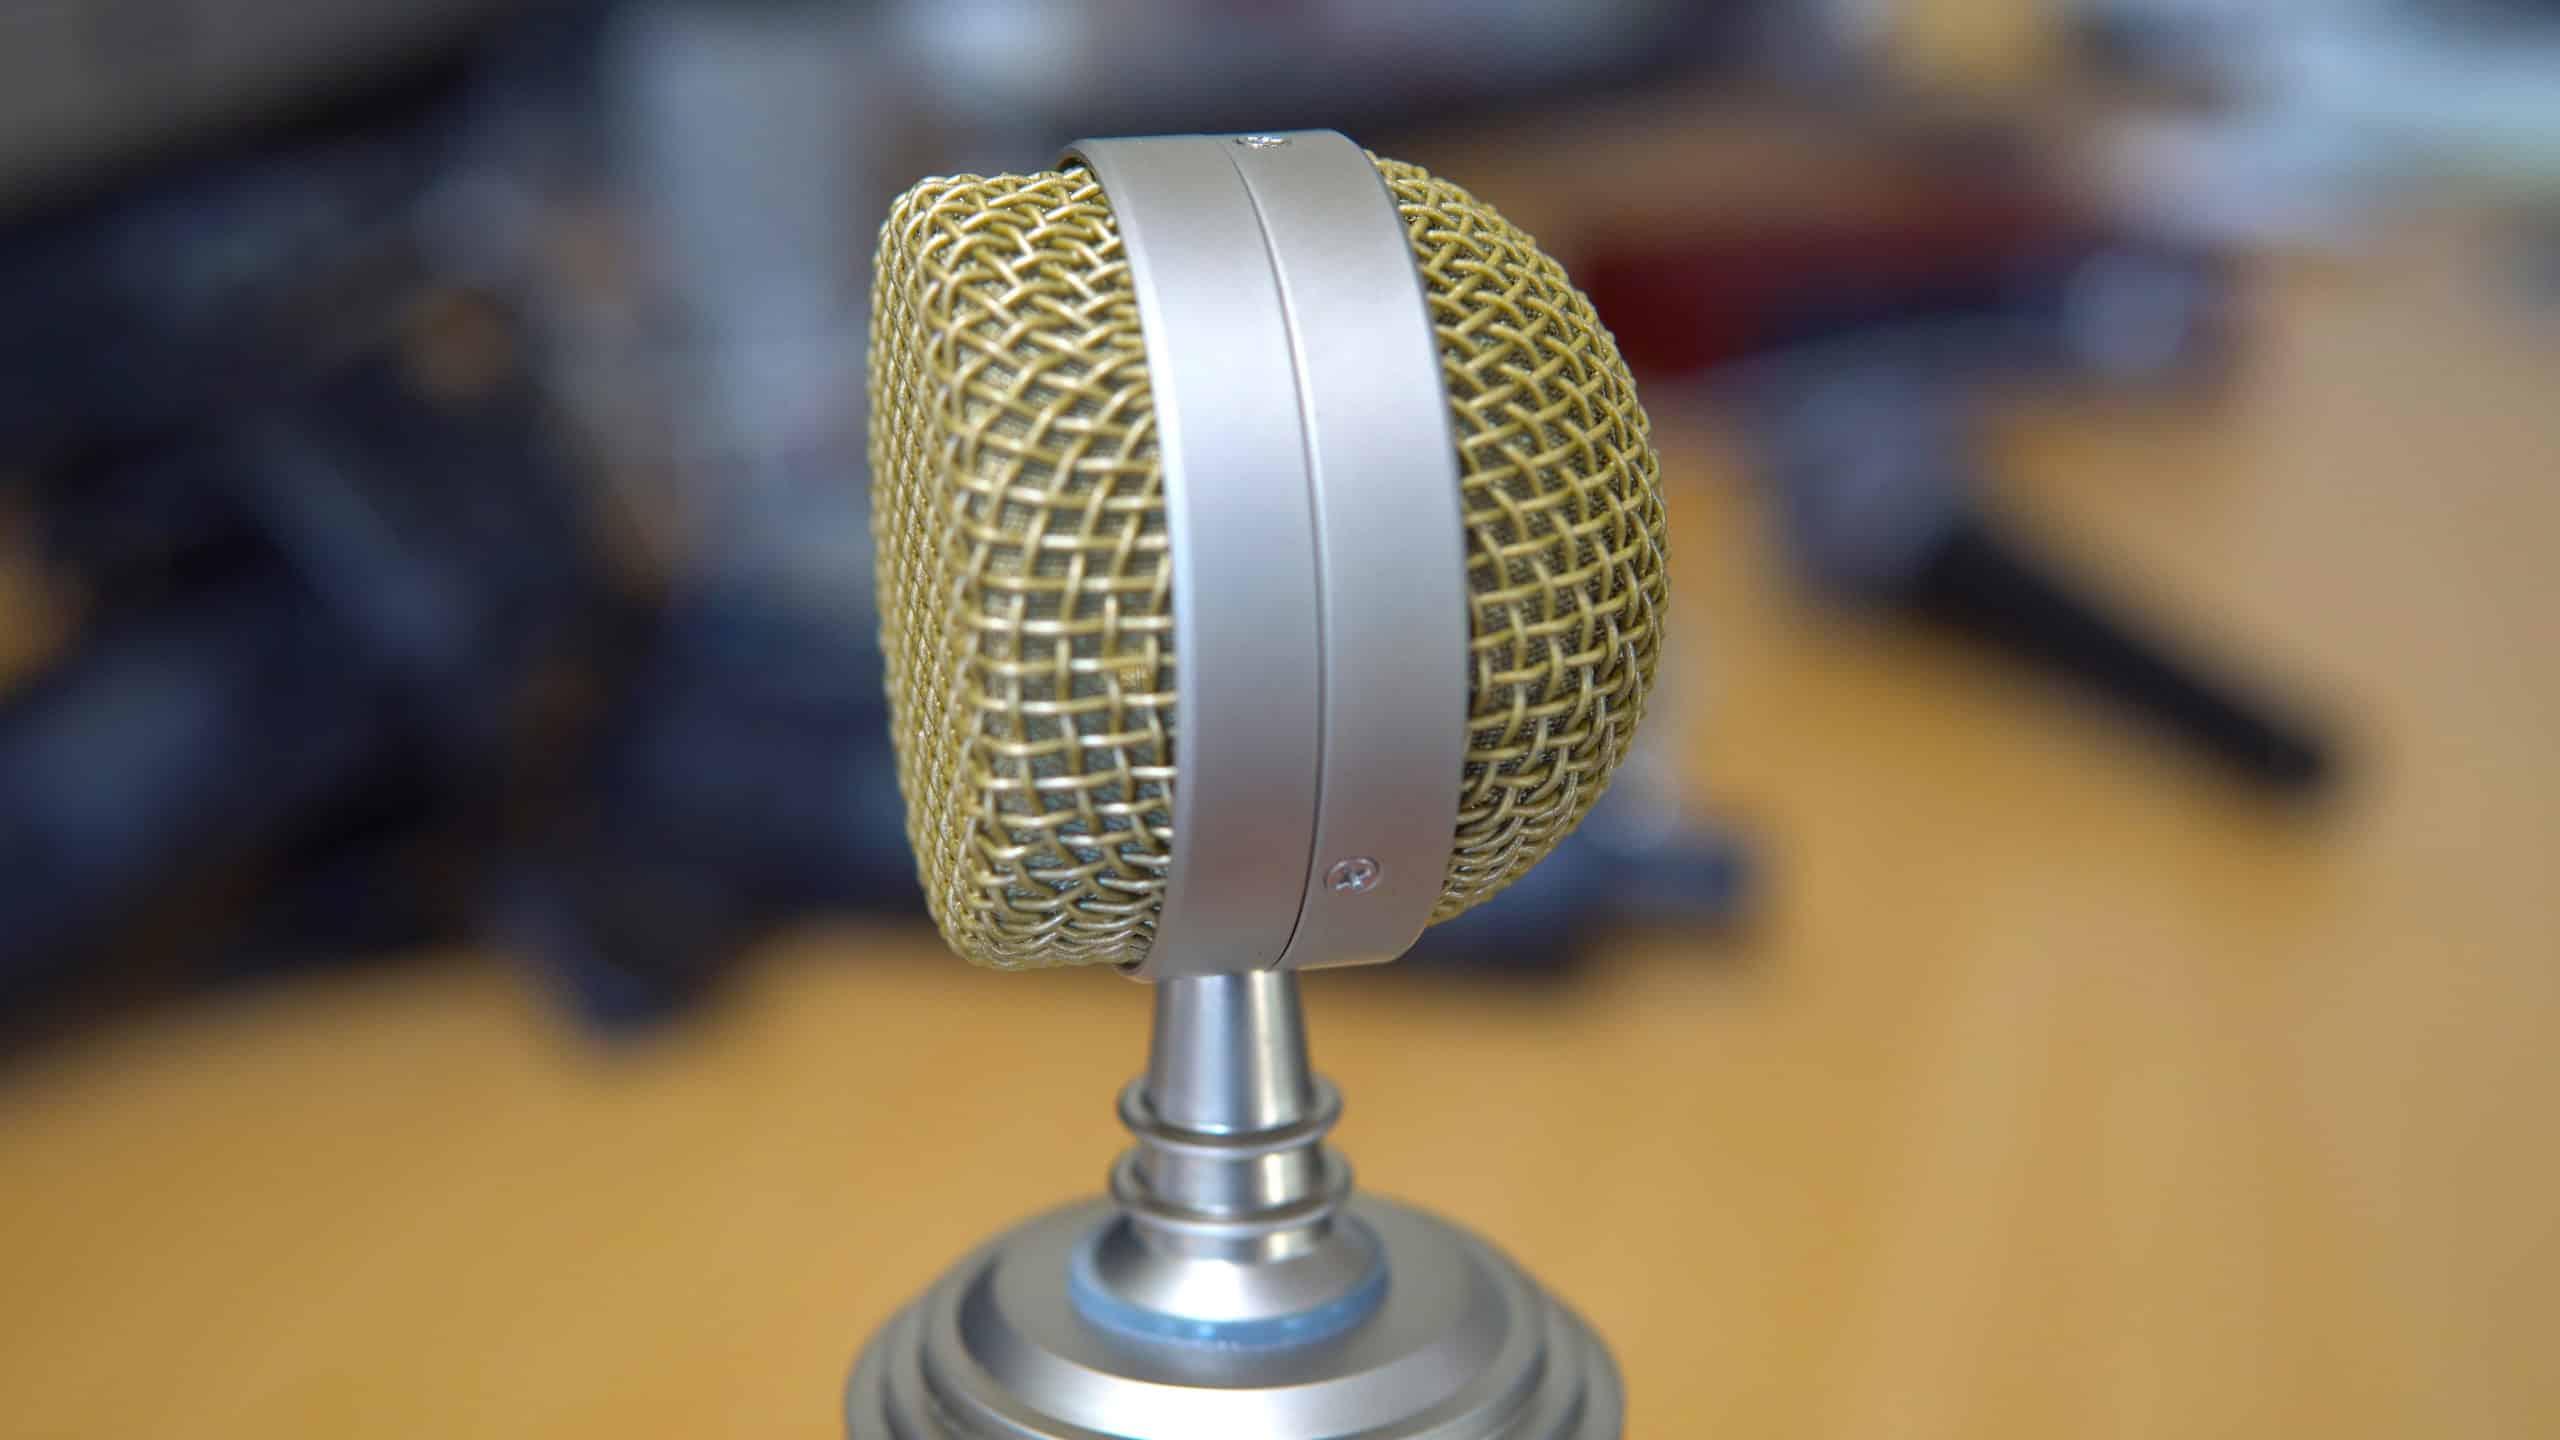 Blue Bluebird SL Microphone